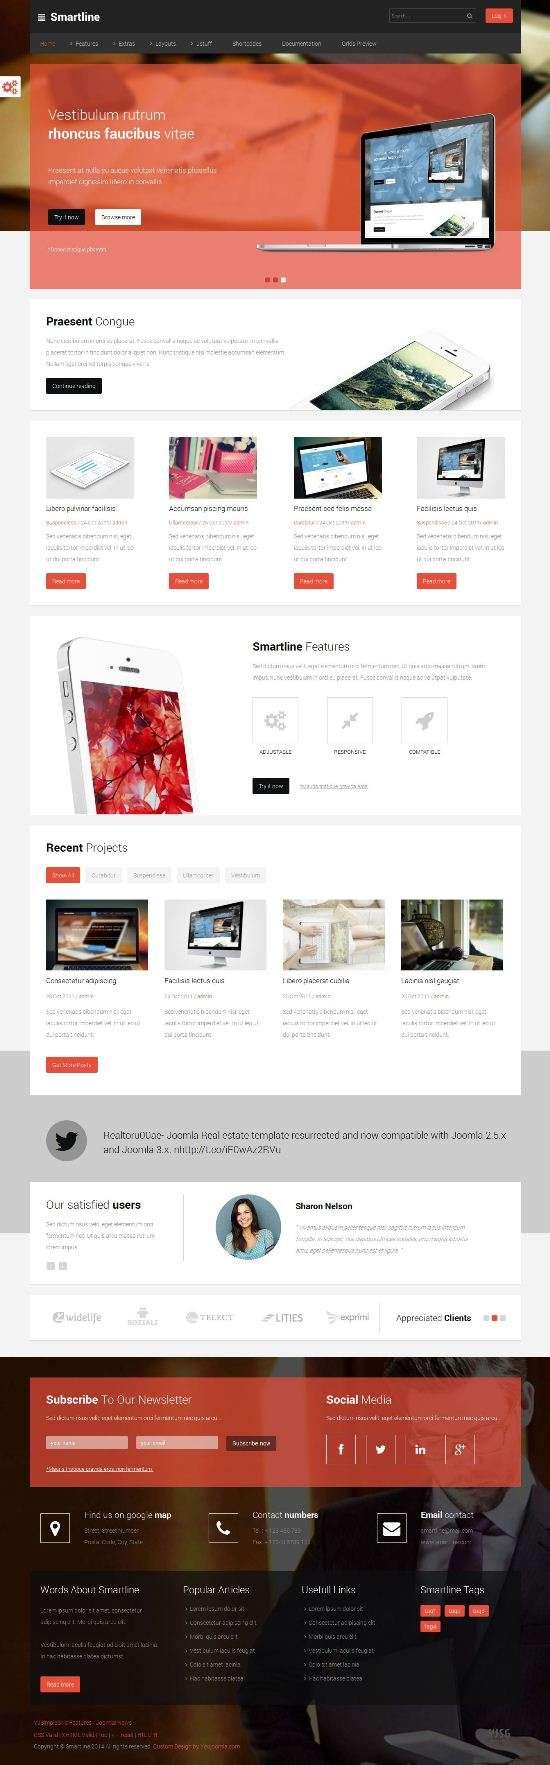 smartline youjoomla business - Smartline Joomla Template